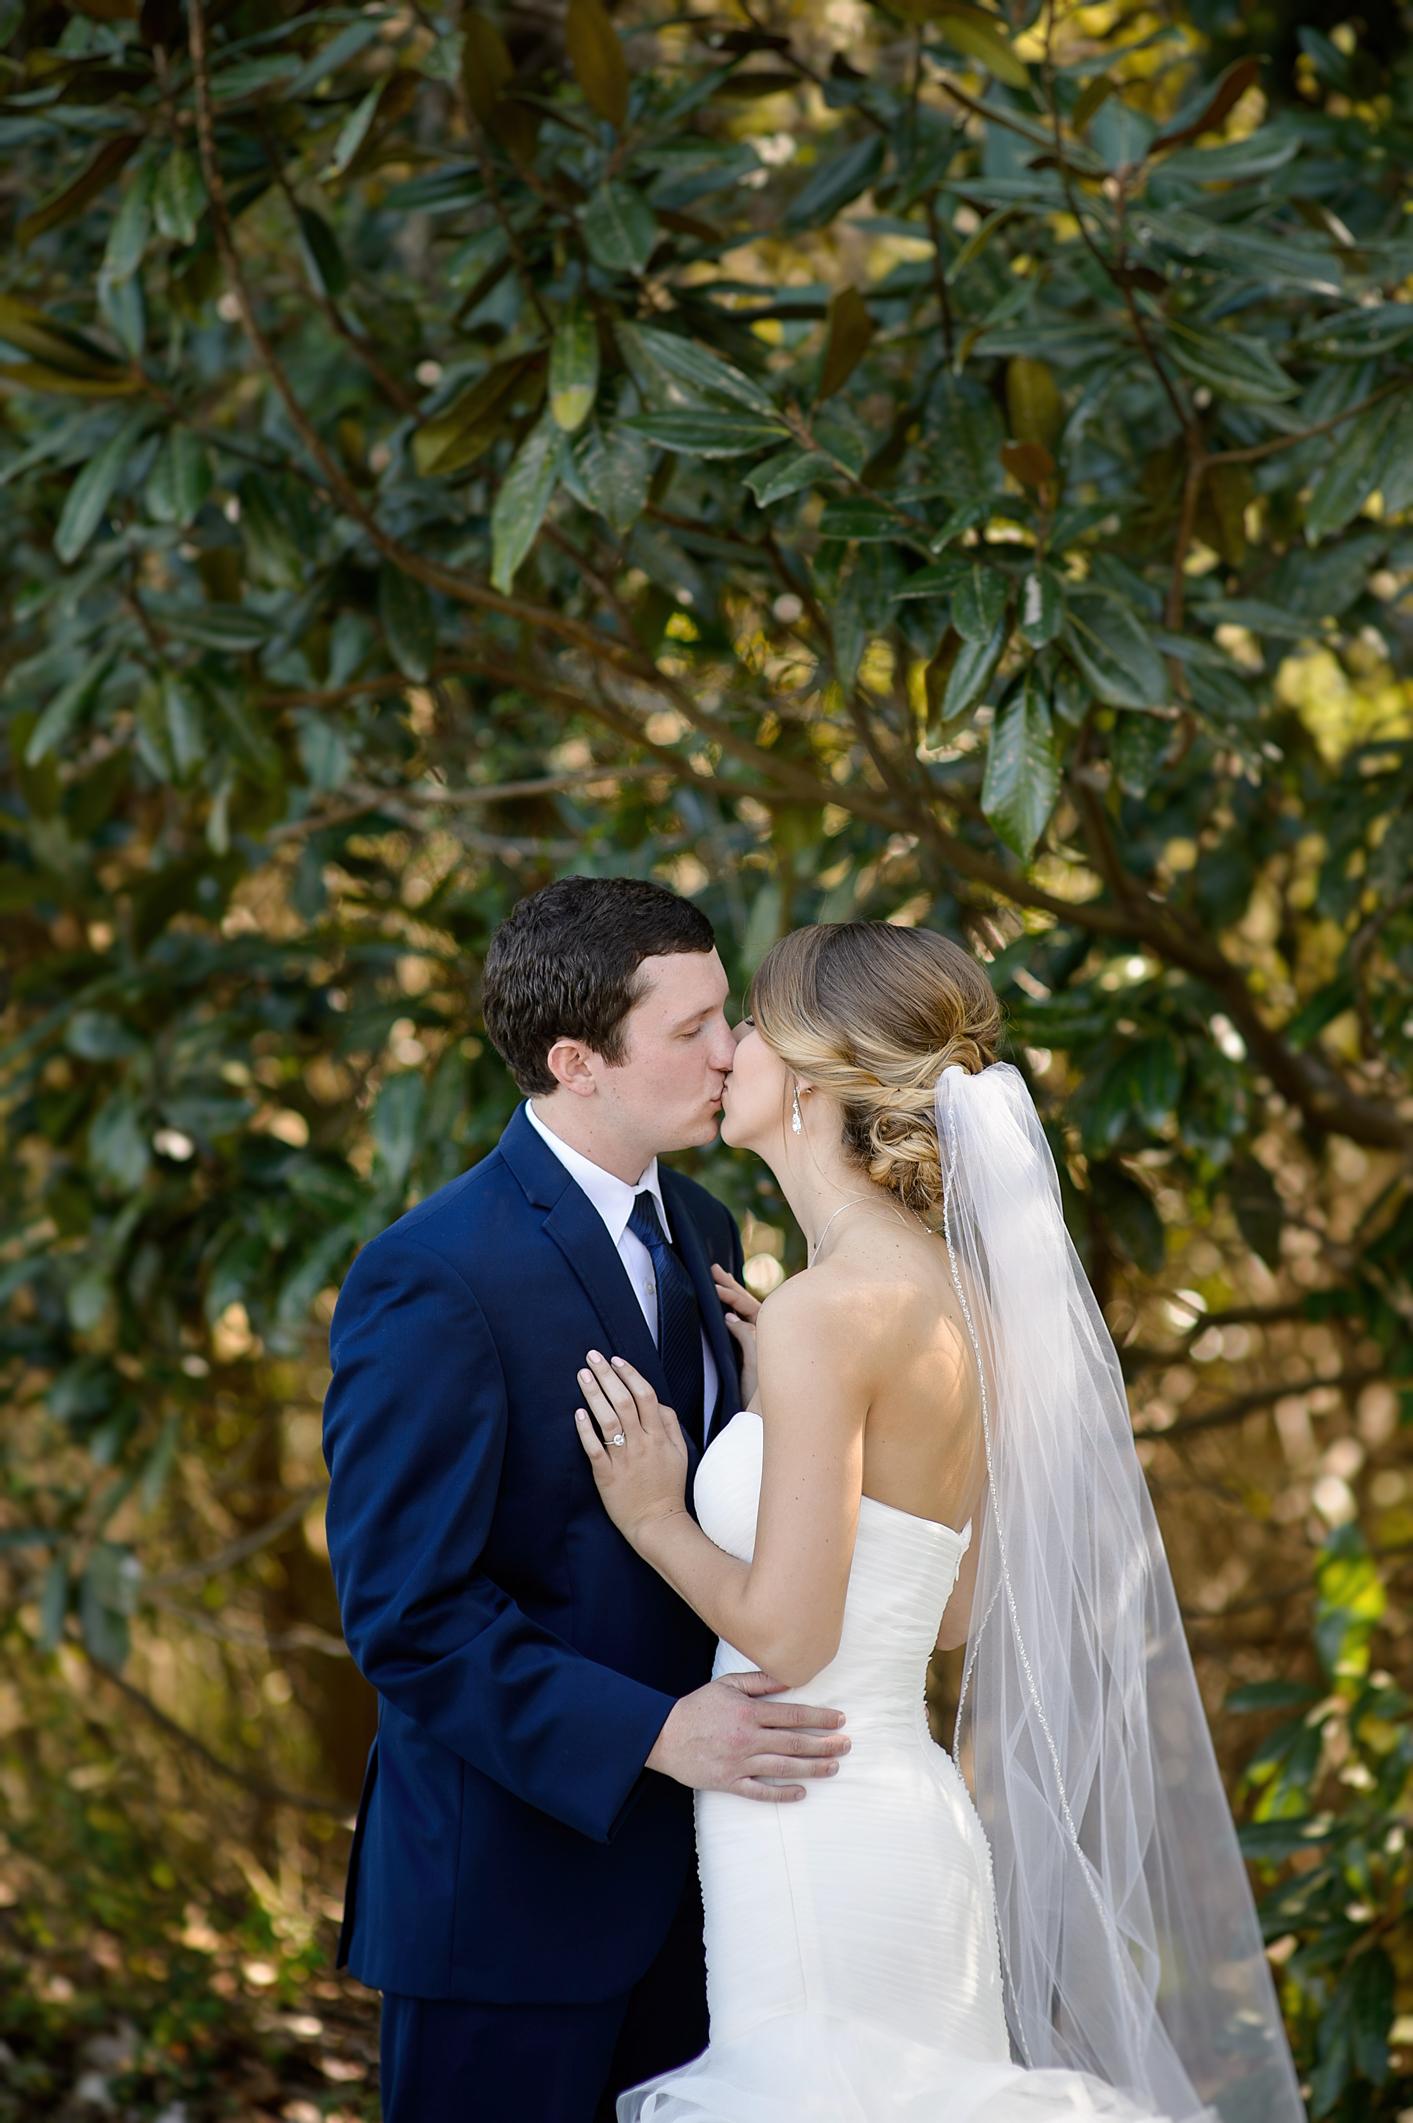 FIRST LOOK WEDDING PHOTOS-10.JPG